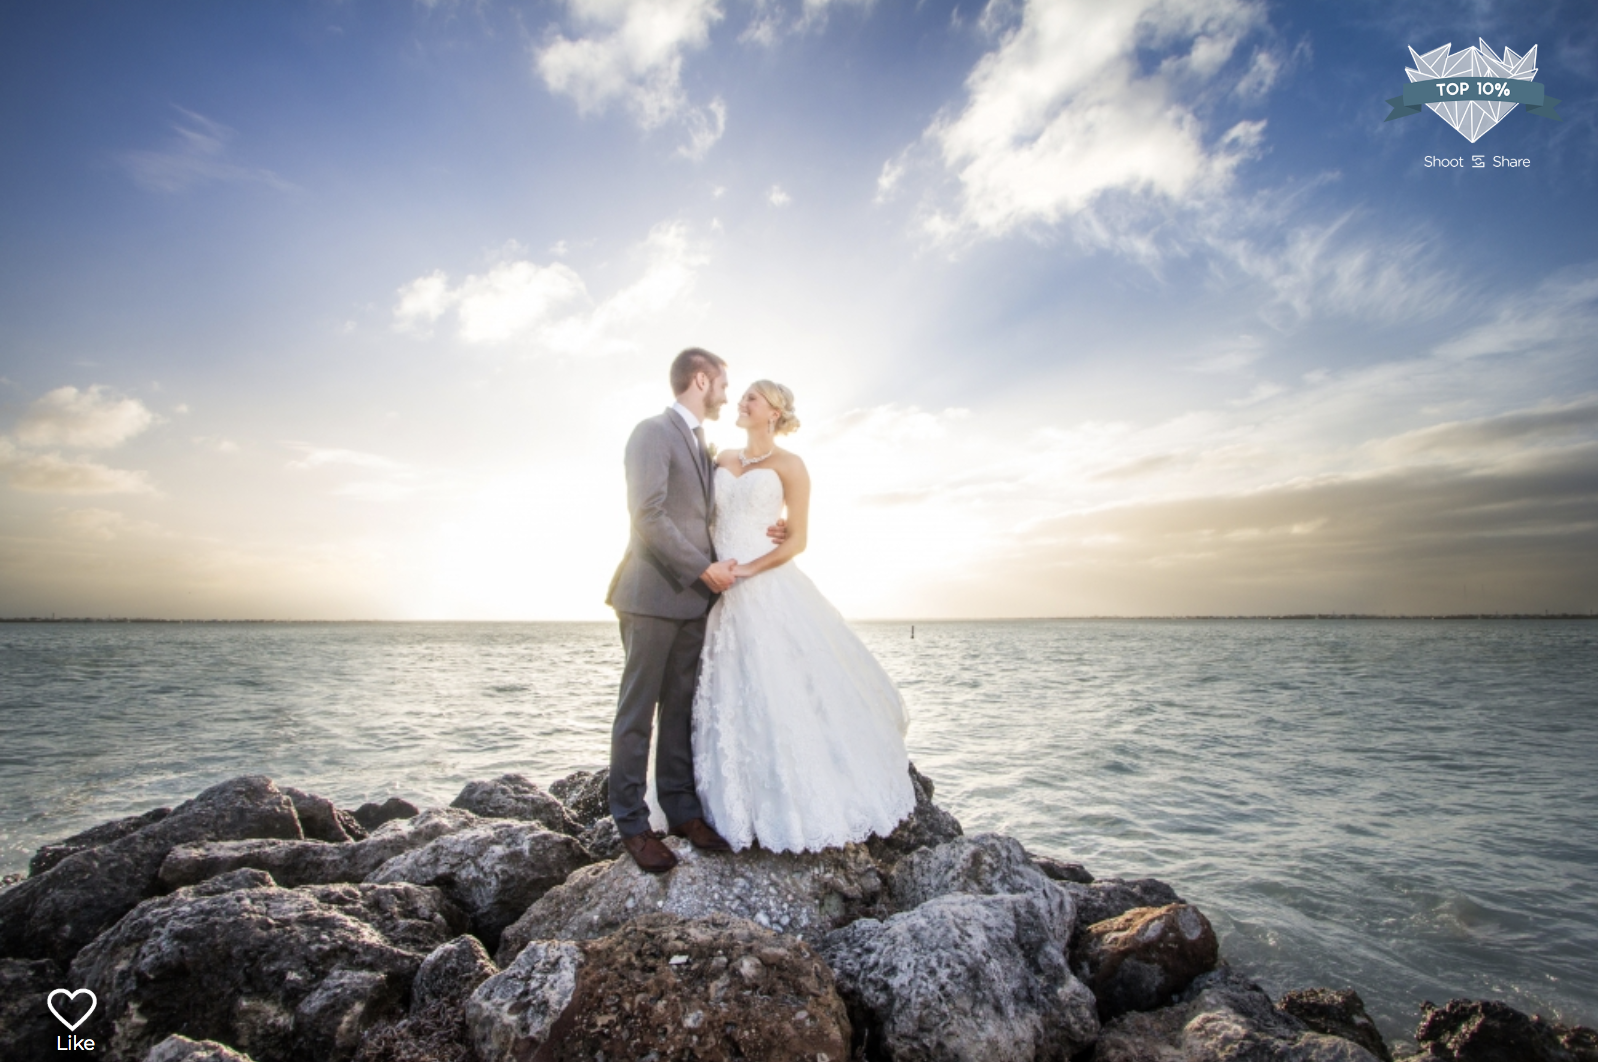 Wedding-photographer-key-west-wins-top-10-percent-for-couples-portrait.png